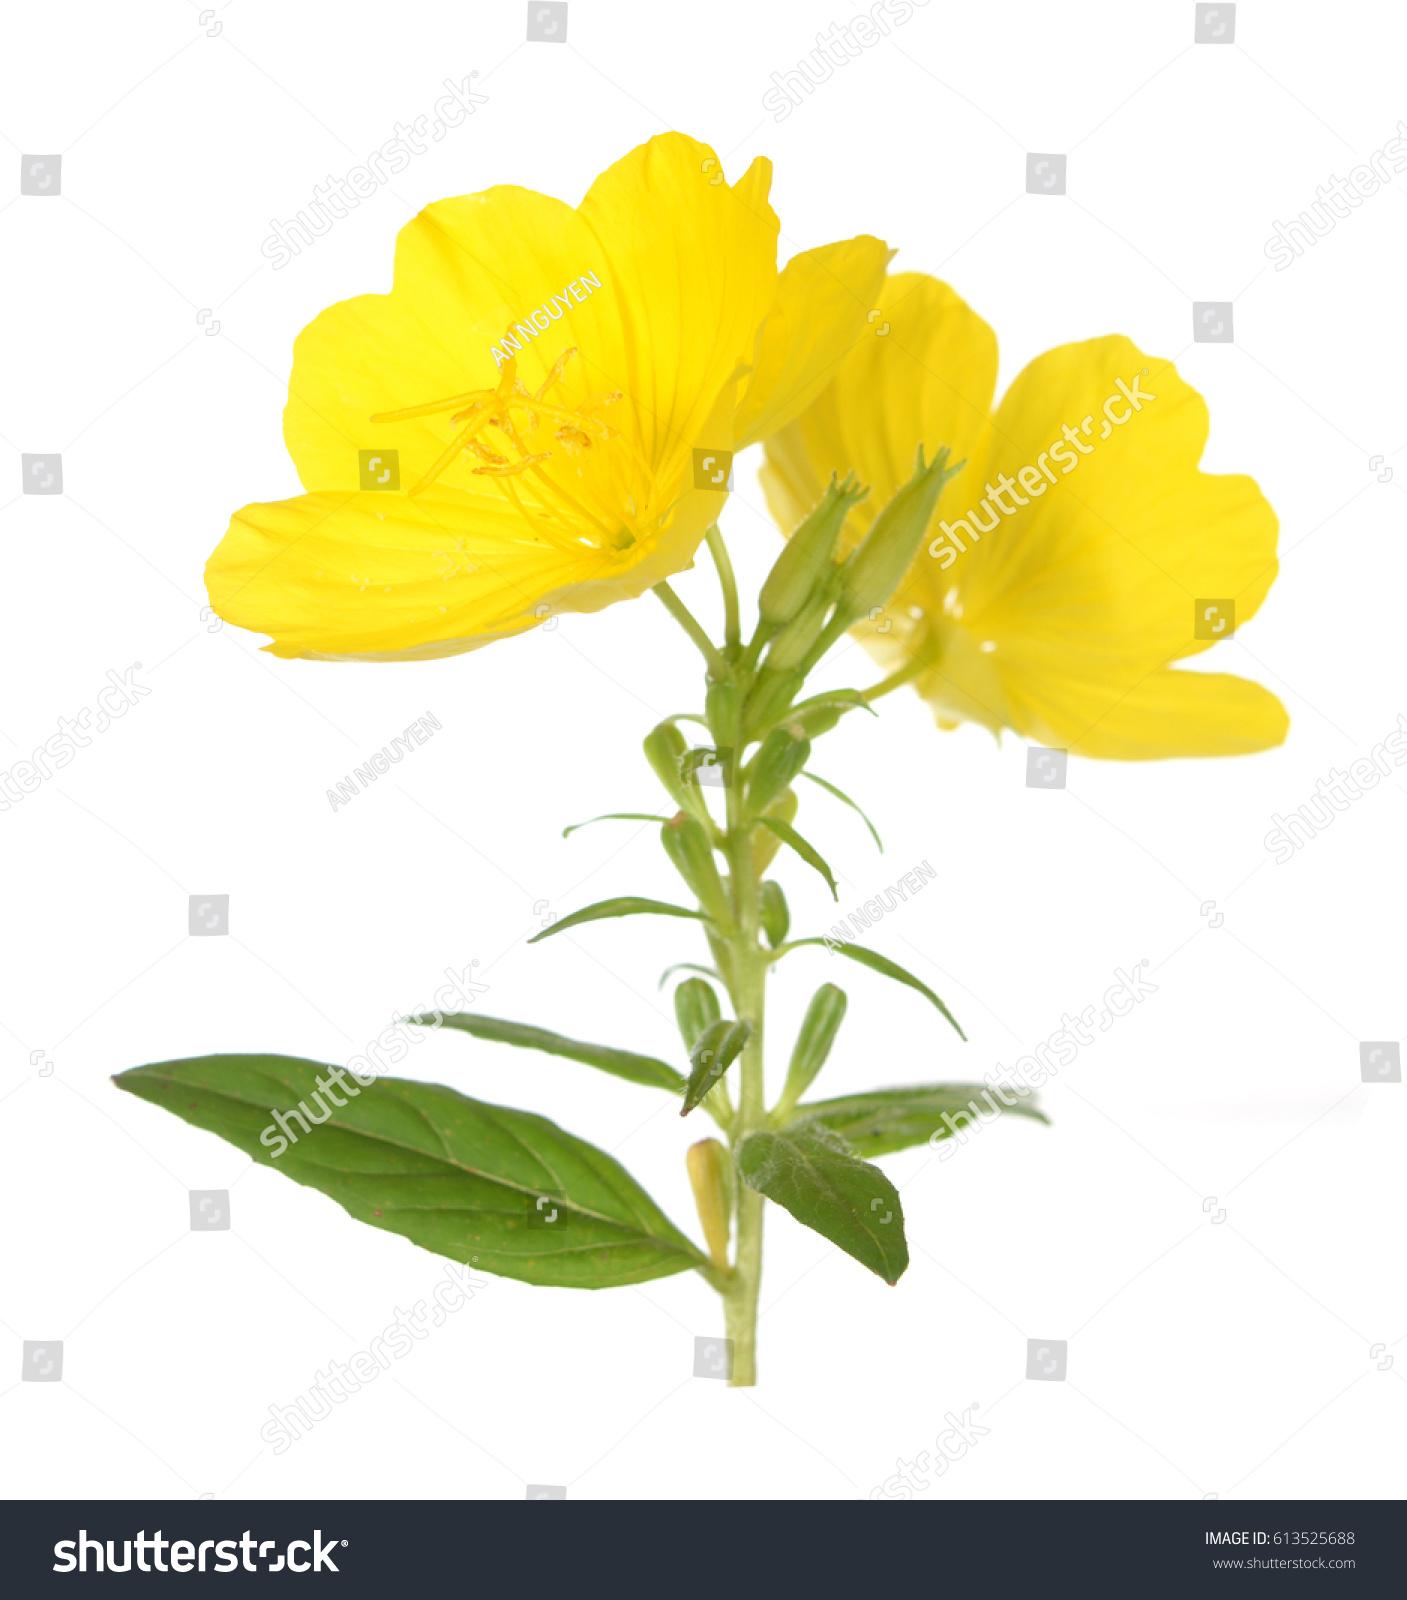 Morning Time Of Yellow Primrose Oenothera Frutcosa Flower Isolated